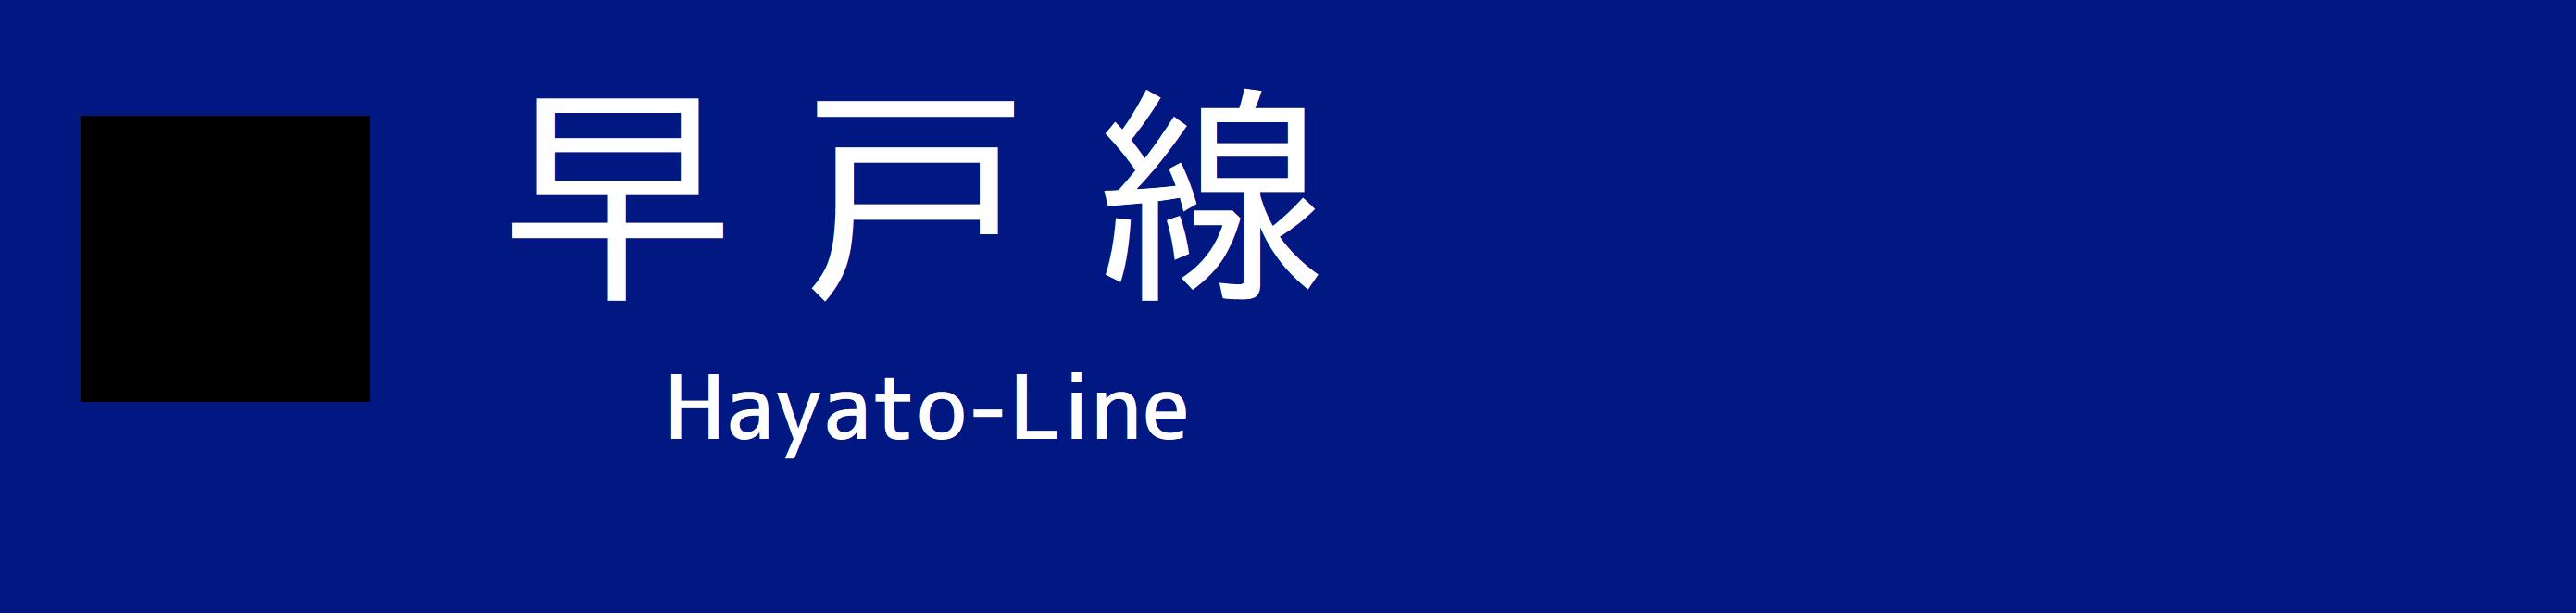 早戸線.png